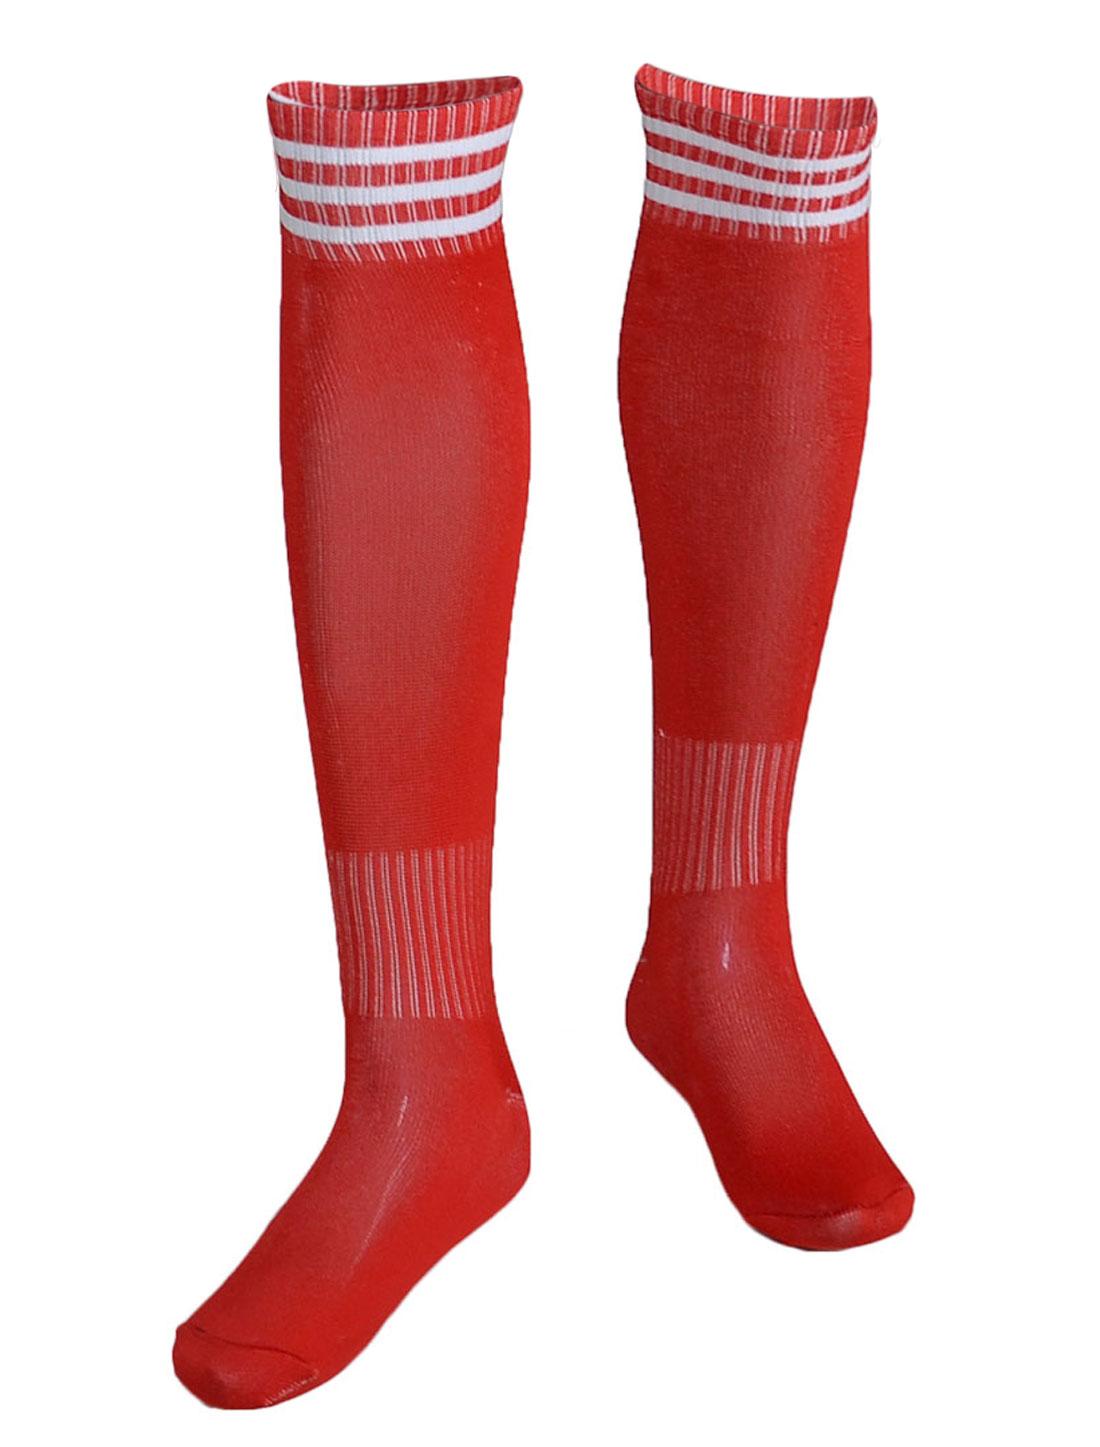 Boys Striped Knee High Soccer Hockey Football Socks Stockings Red Pair